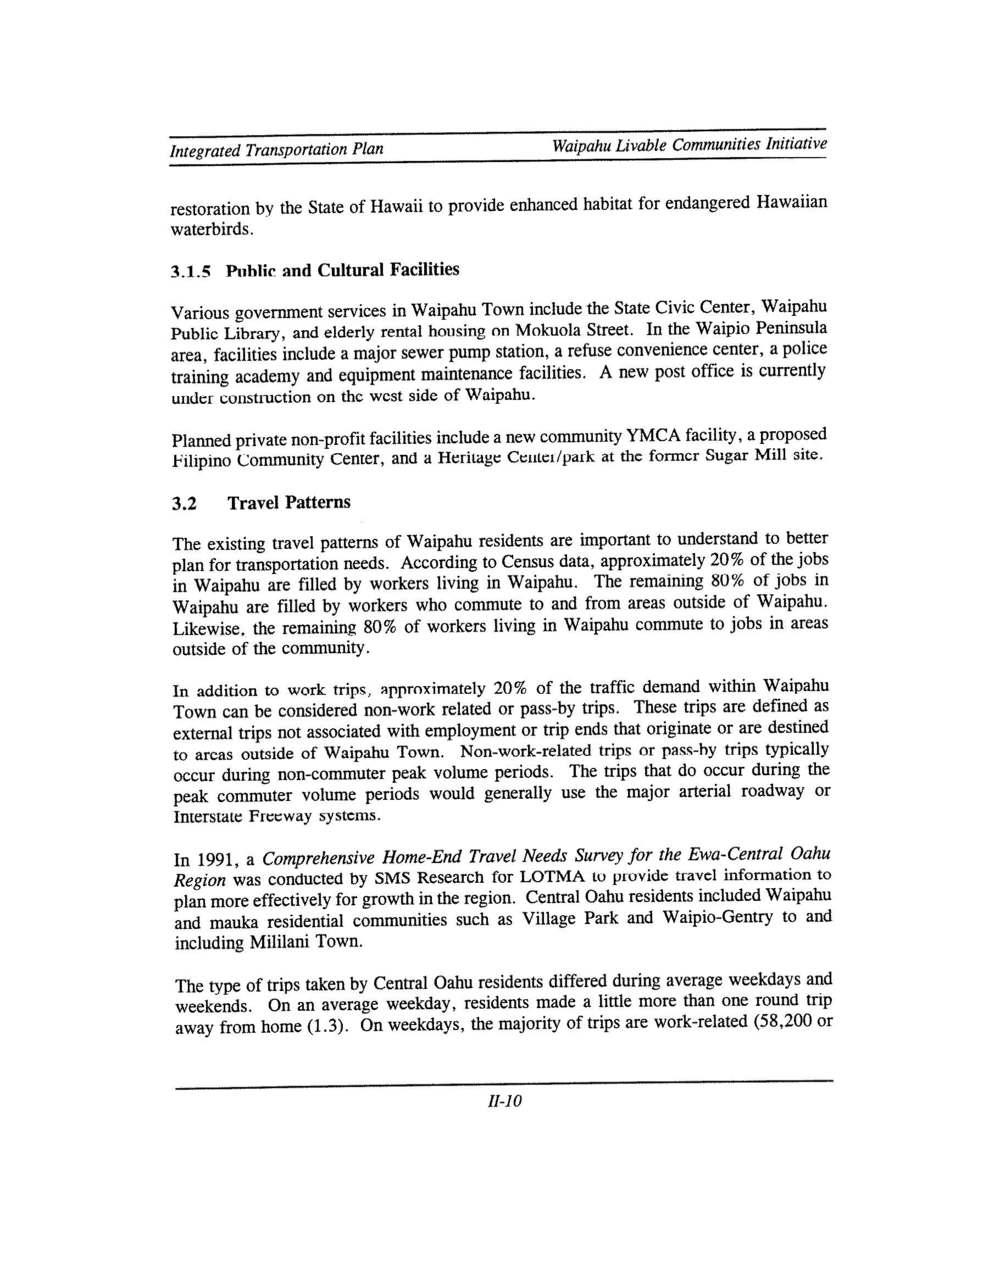 160531_WaipahuLivableCommunities(1998)_Page_025.jpg